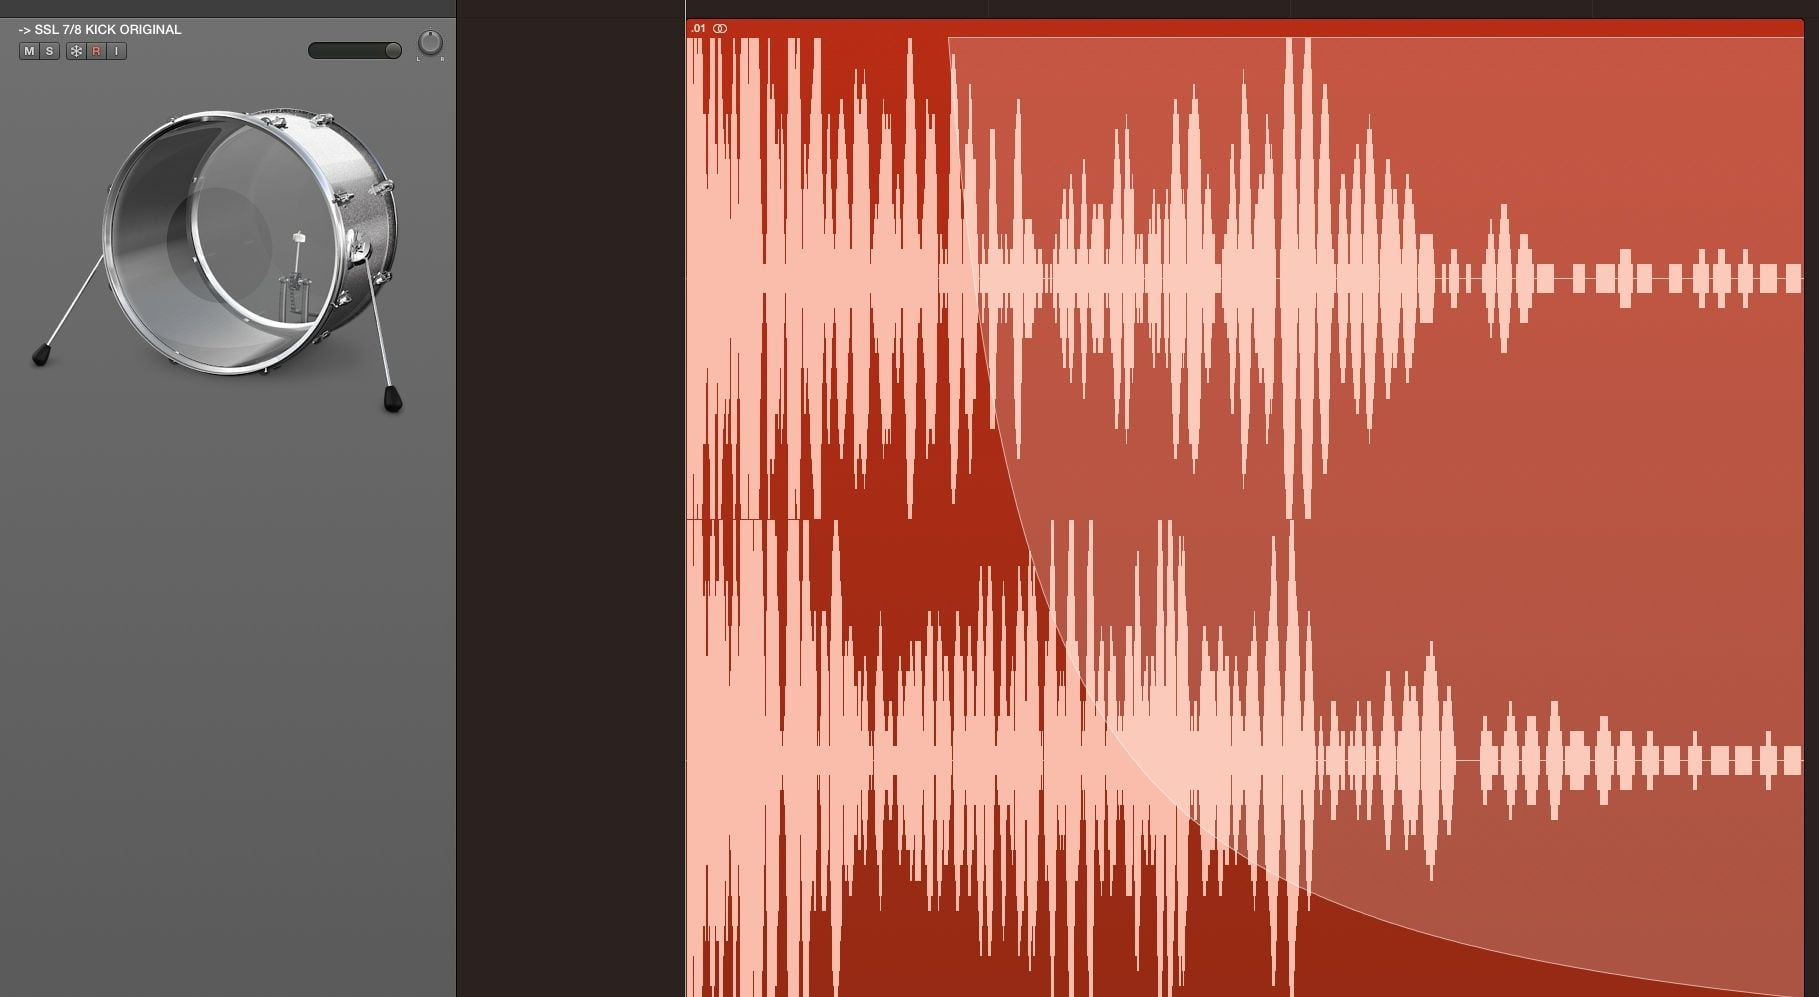 mixing_kicks_logic_pro_x_remove_silence4